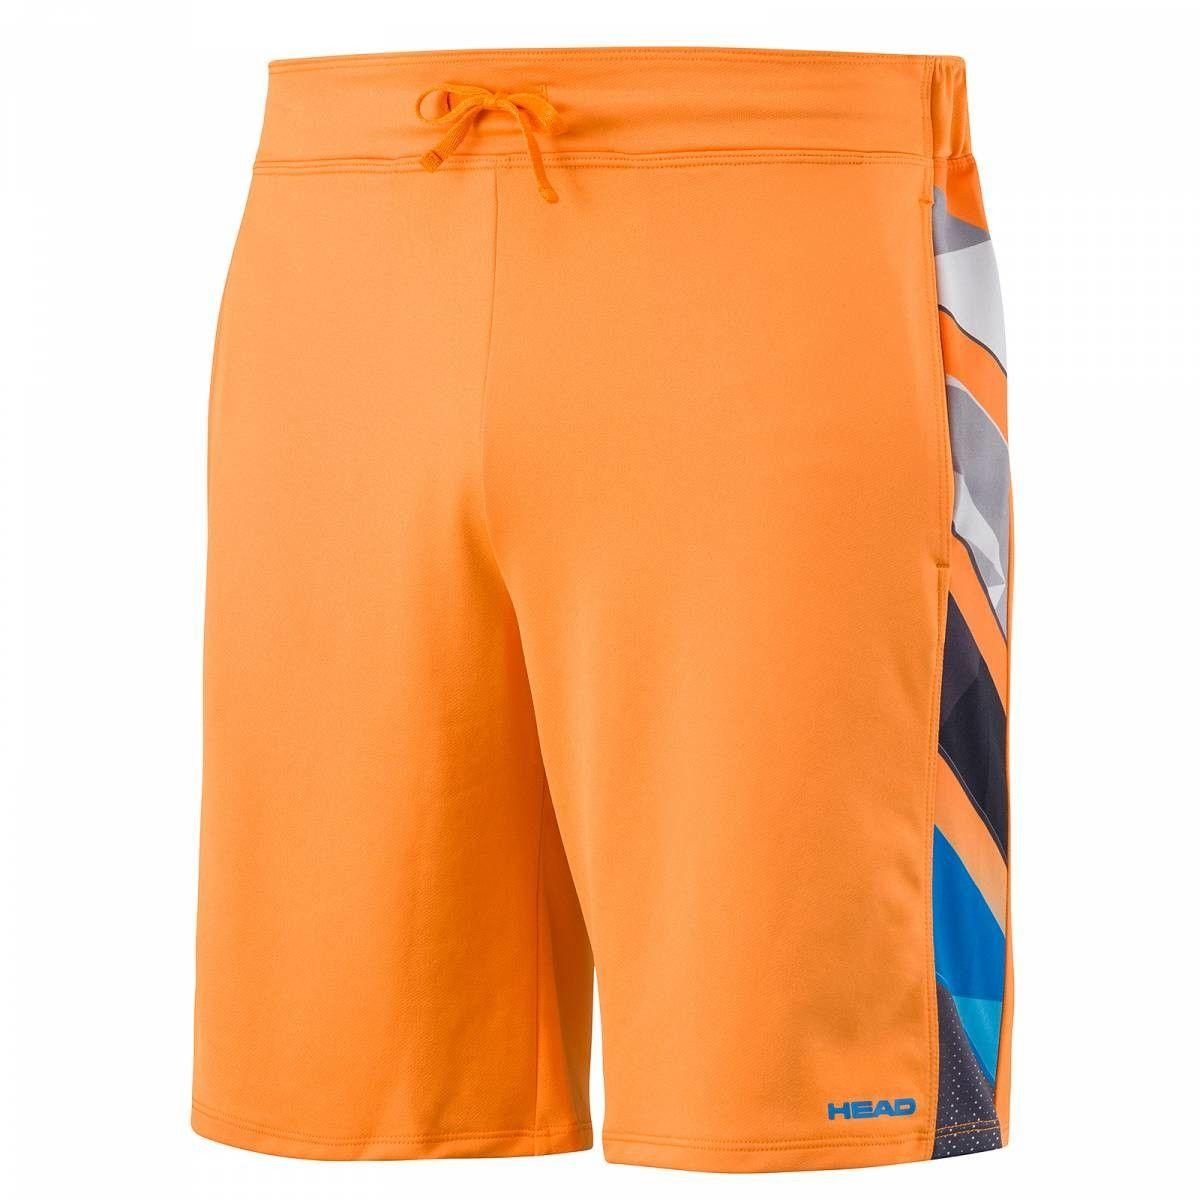 Head Vision Striped Bermuda B - orange